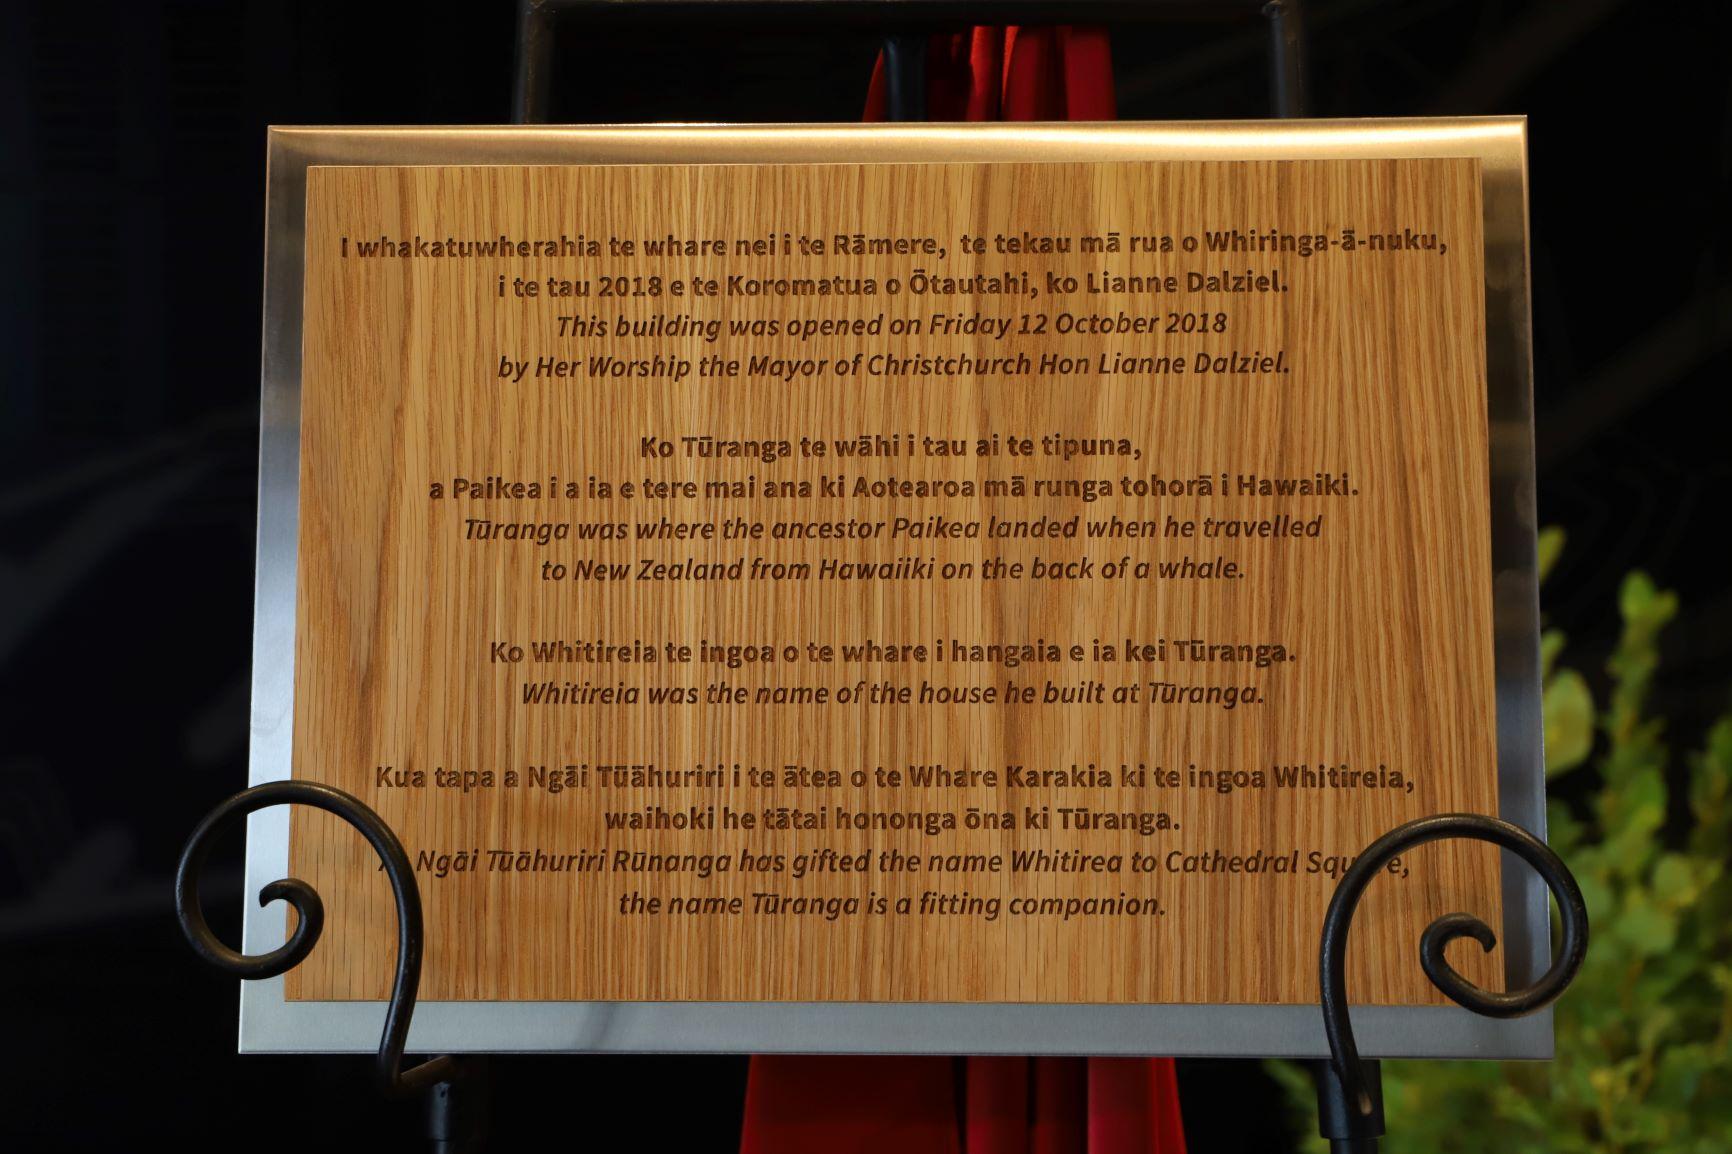 A plaque unveiled at the opening of Tūranga / Christchurch Central Library explaining the origin of its name and significance to Te Ngāi Tūāhuriri Rūnanga.